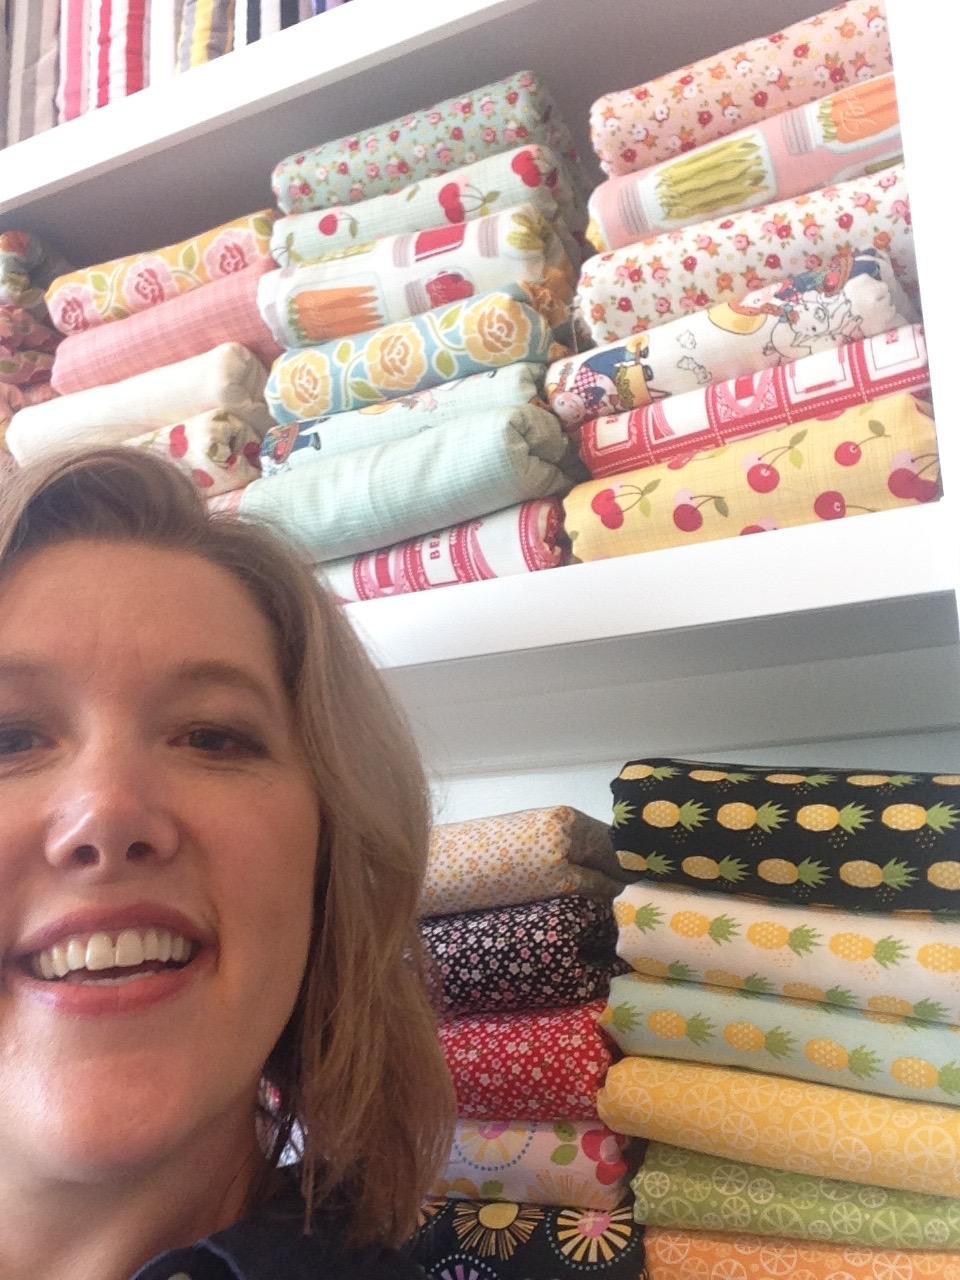 Selfie in the Riley Blake board room.